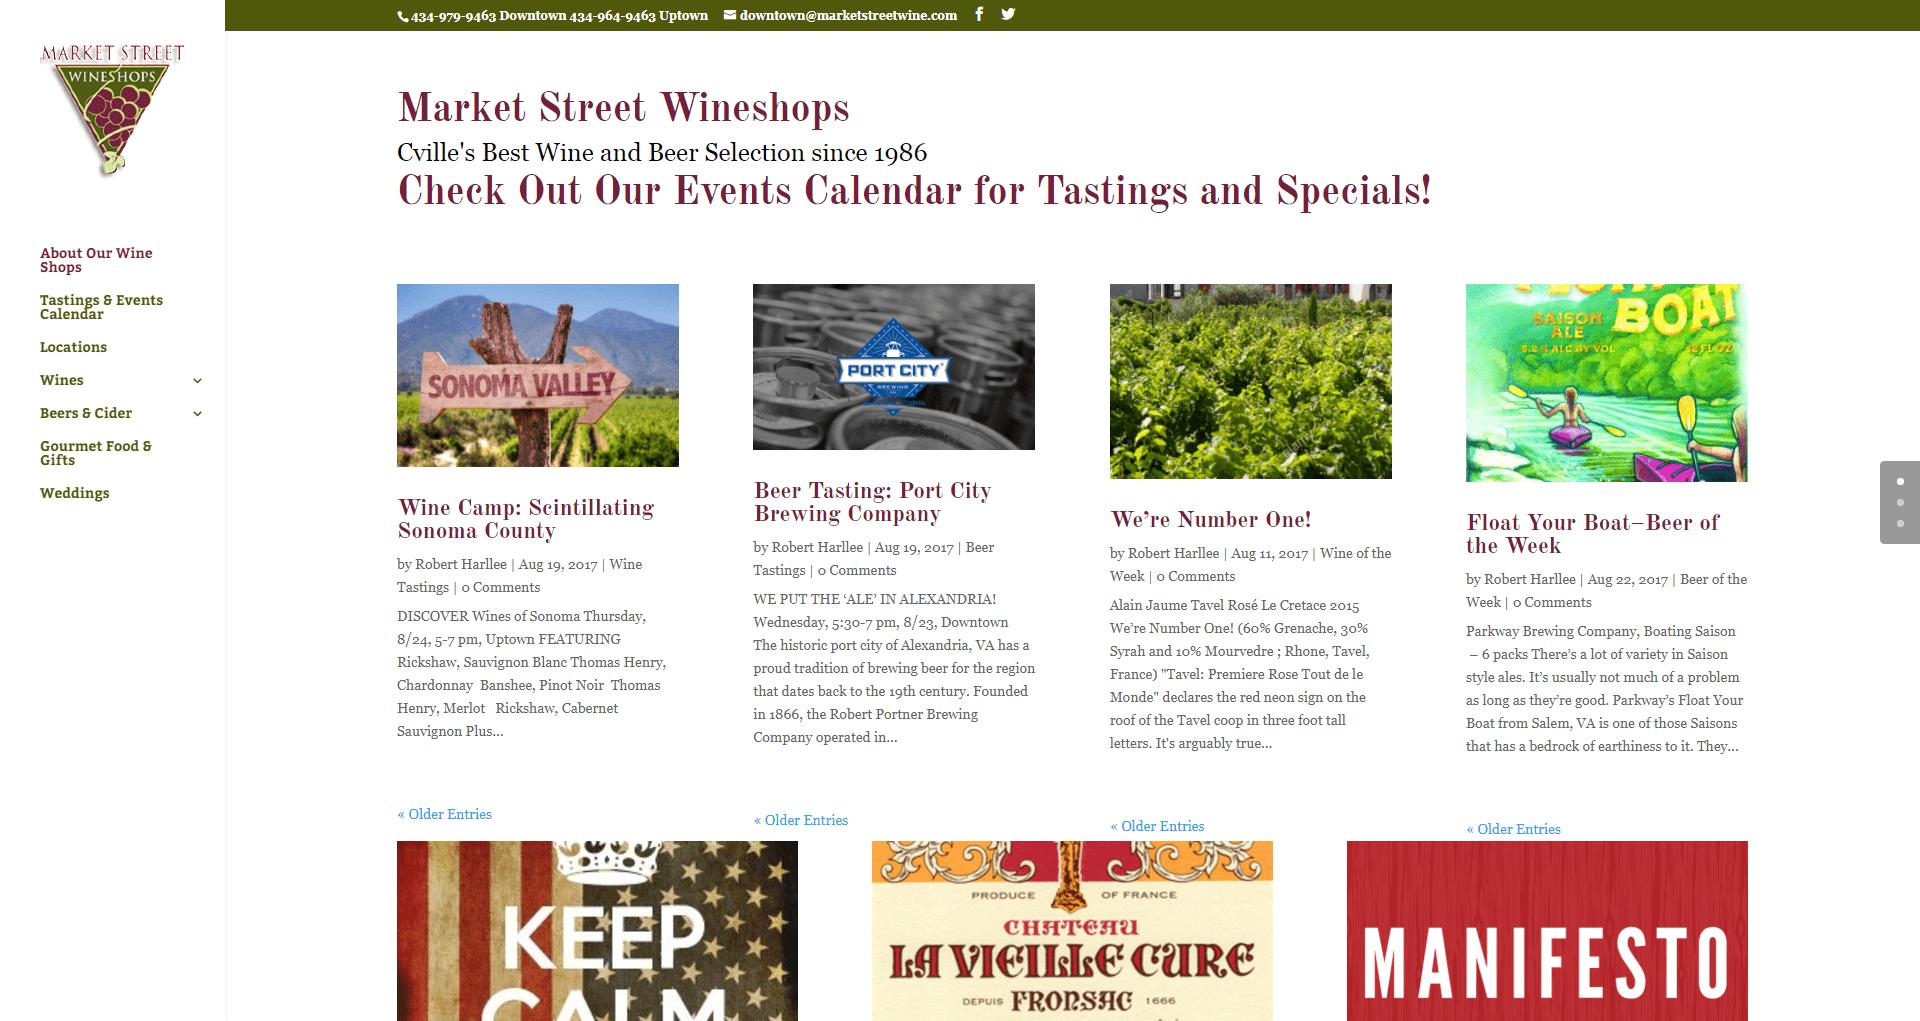 Market Street Wineshops Website